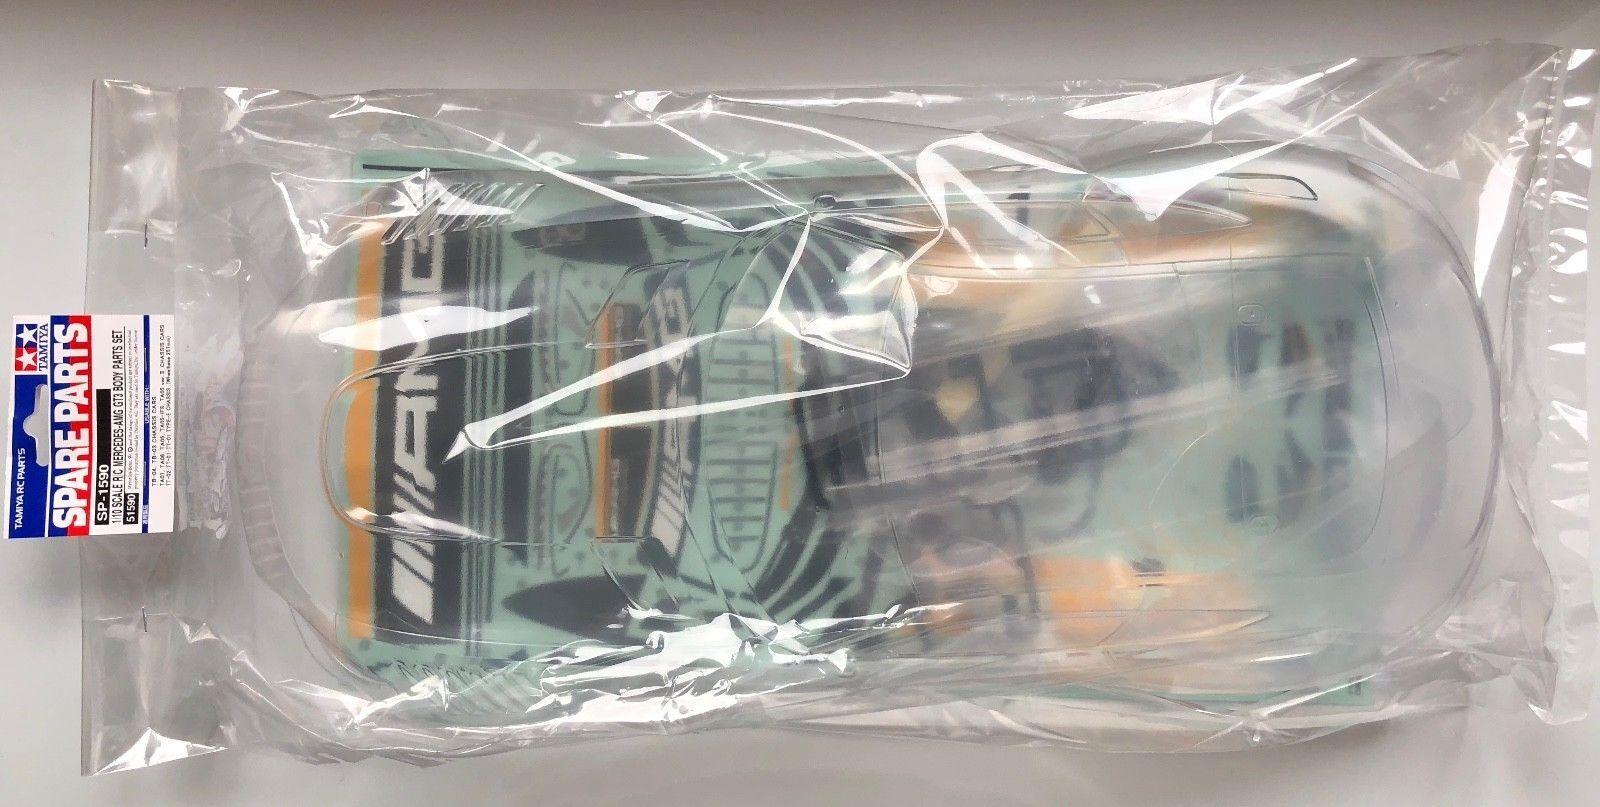 TAMIYA 1 10 CARROZZERIA IN LEXAN CON ADESIVI ADESIVI ADESIVI MERCEDES AMG GT3 ART 51590 SP-1590 c98468